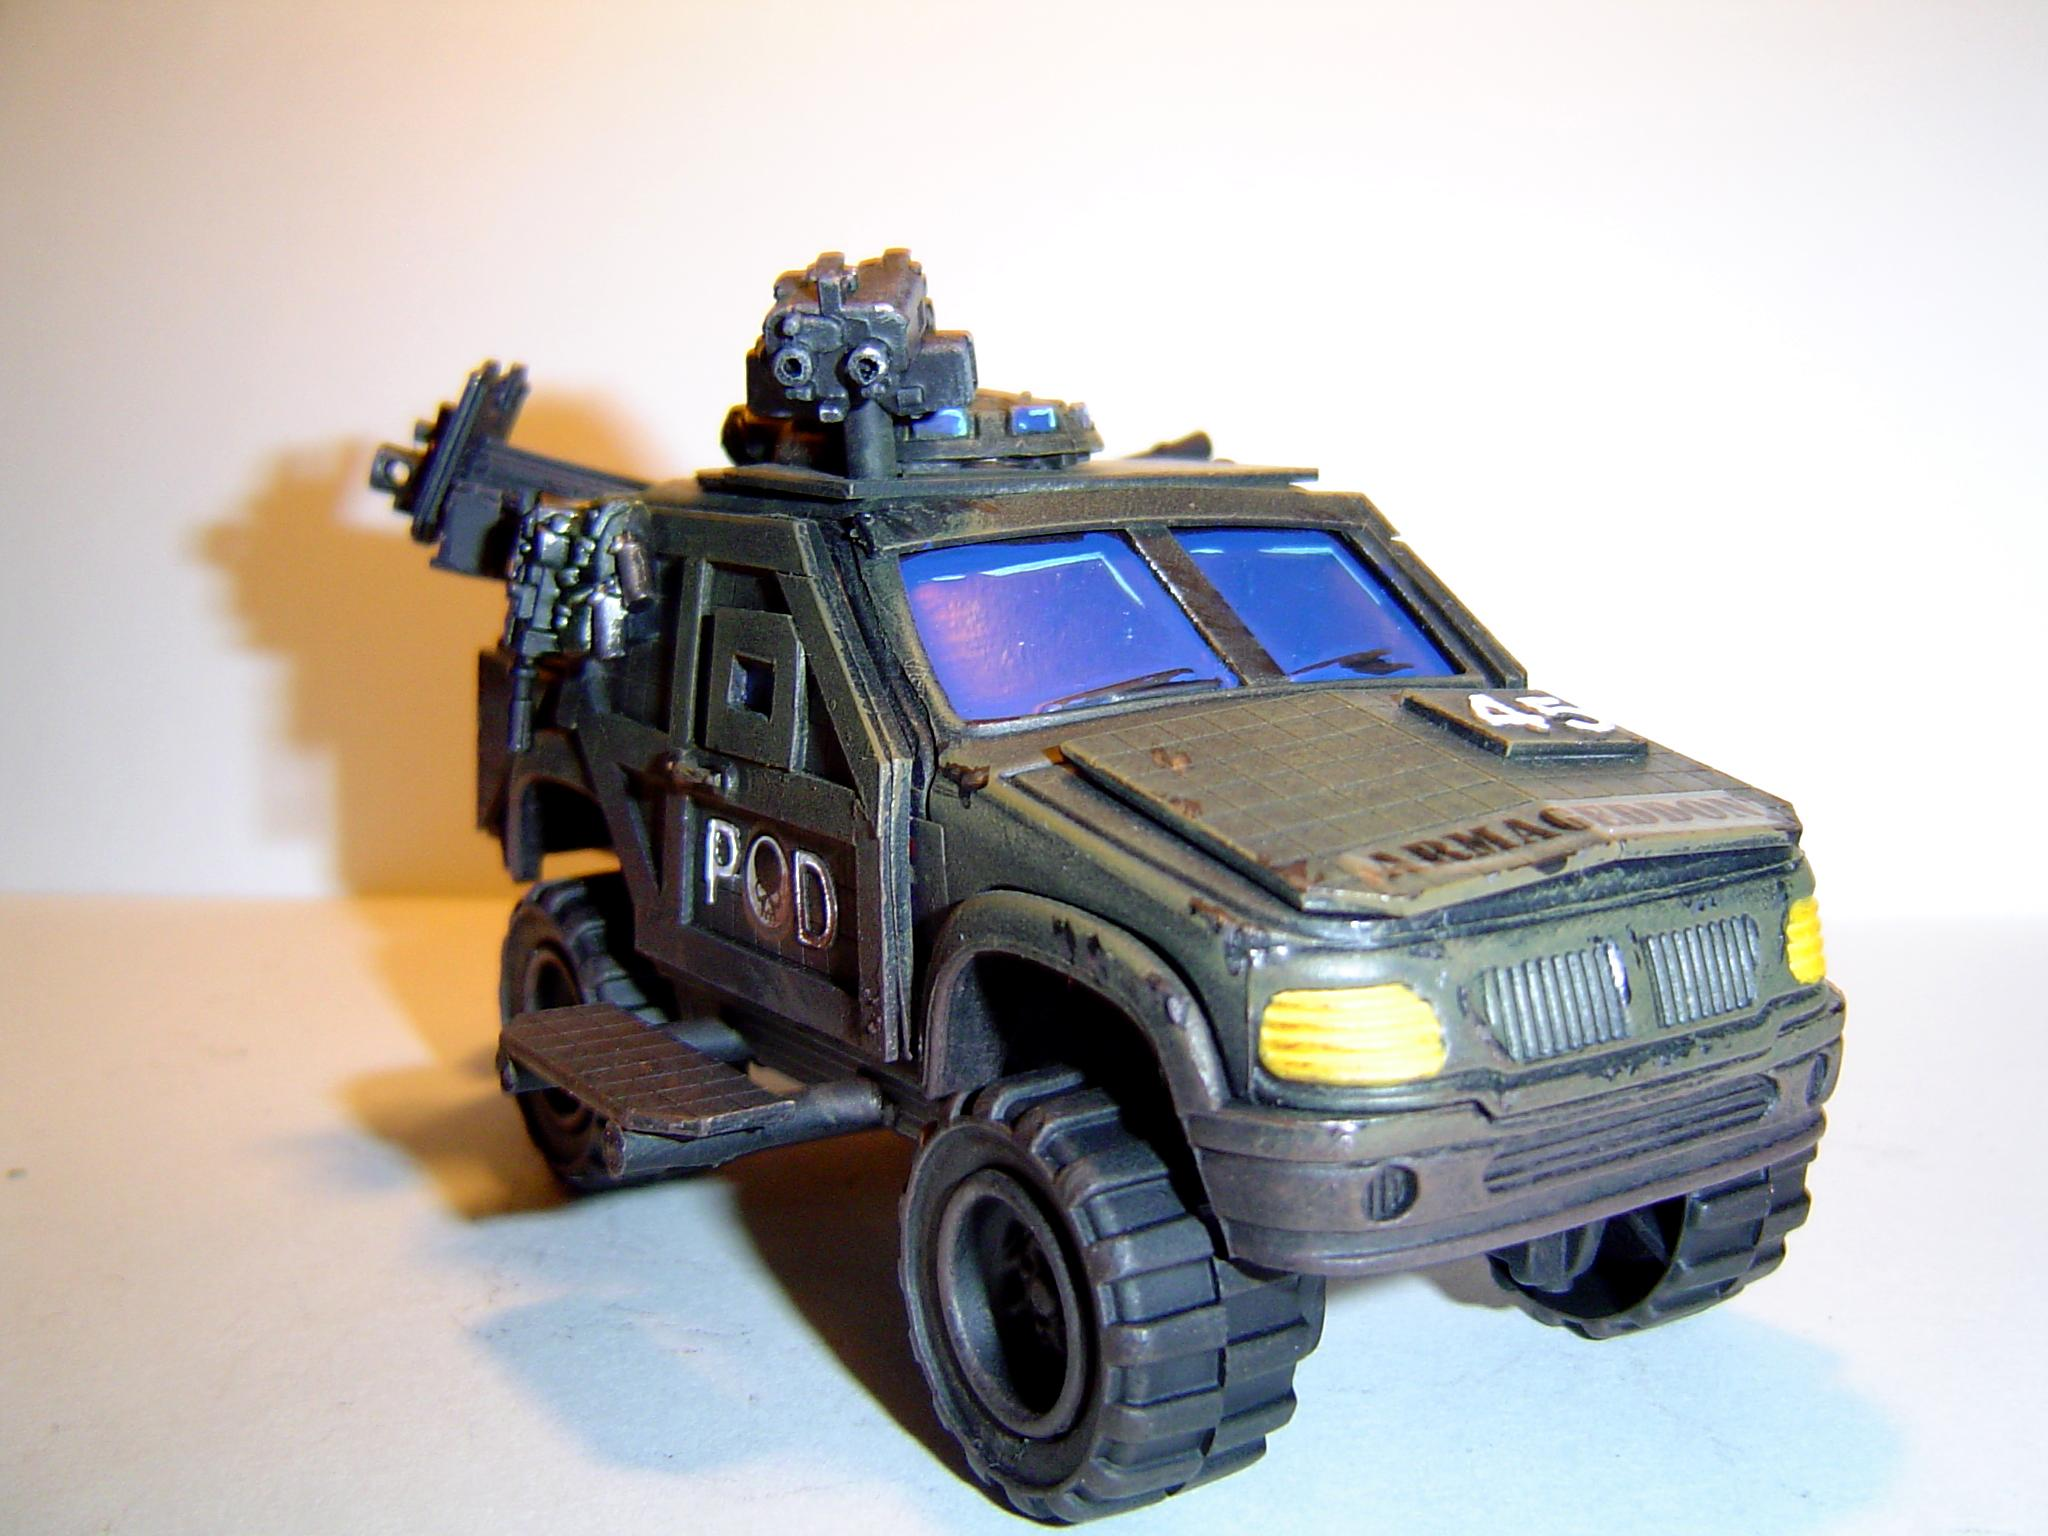 4x4, Armored Car, Hummer, Imperial Guard, Jeep, Leman Russ, Salimander, Sentinel, Steel Legion, Tank, Warhammer 40,000